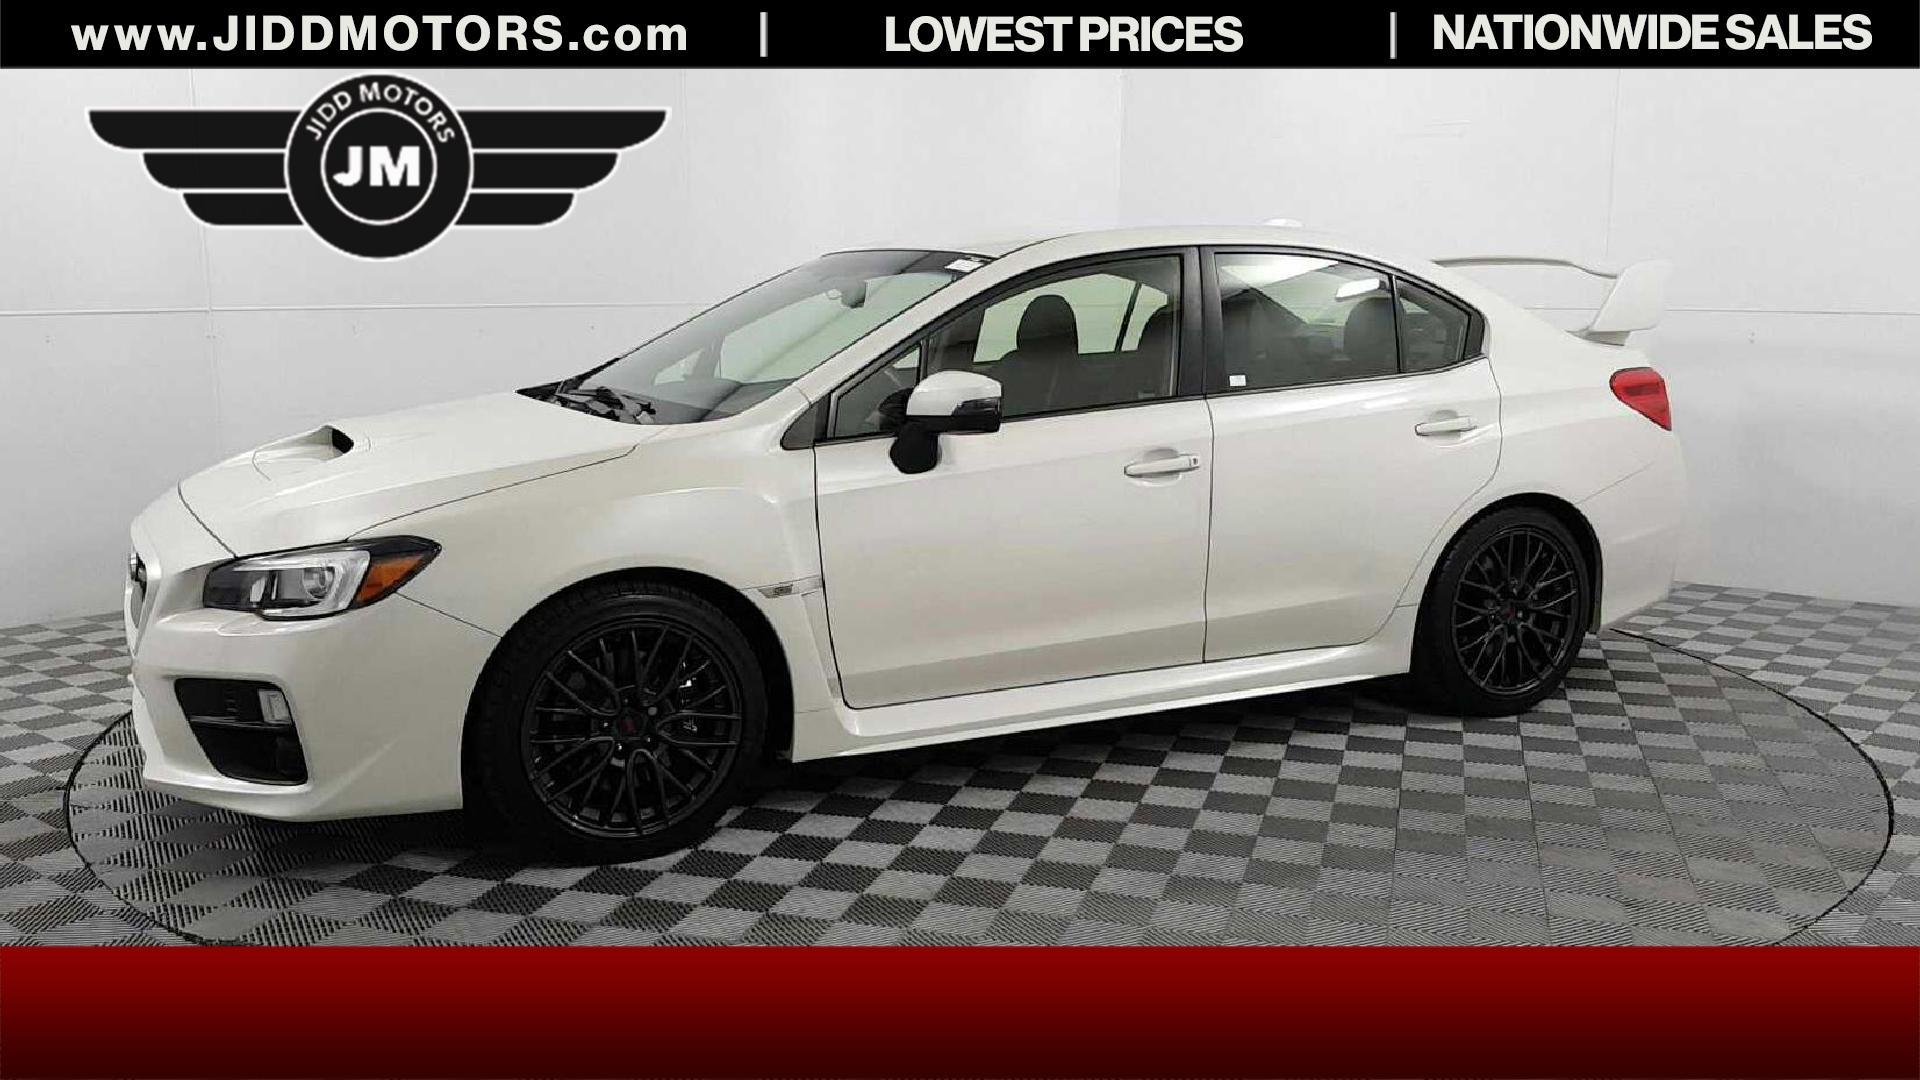 Used Subaru For Sale In Des Plaines Il Jidd Motors